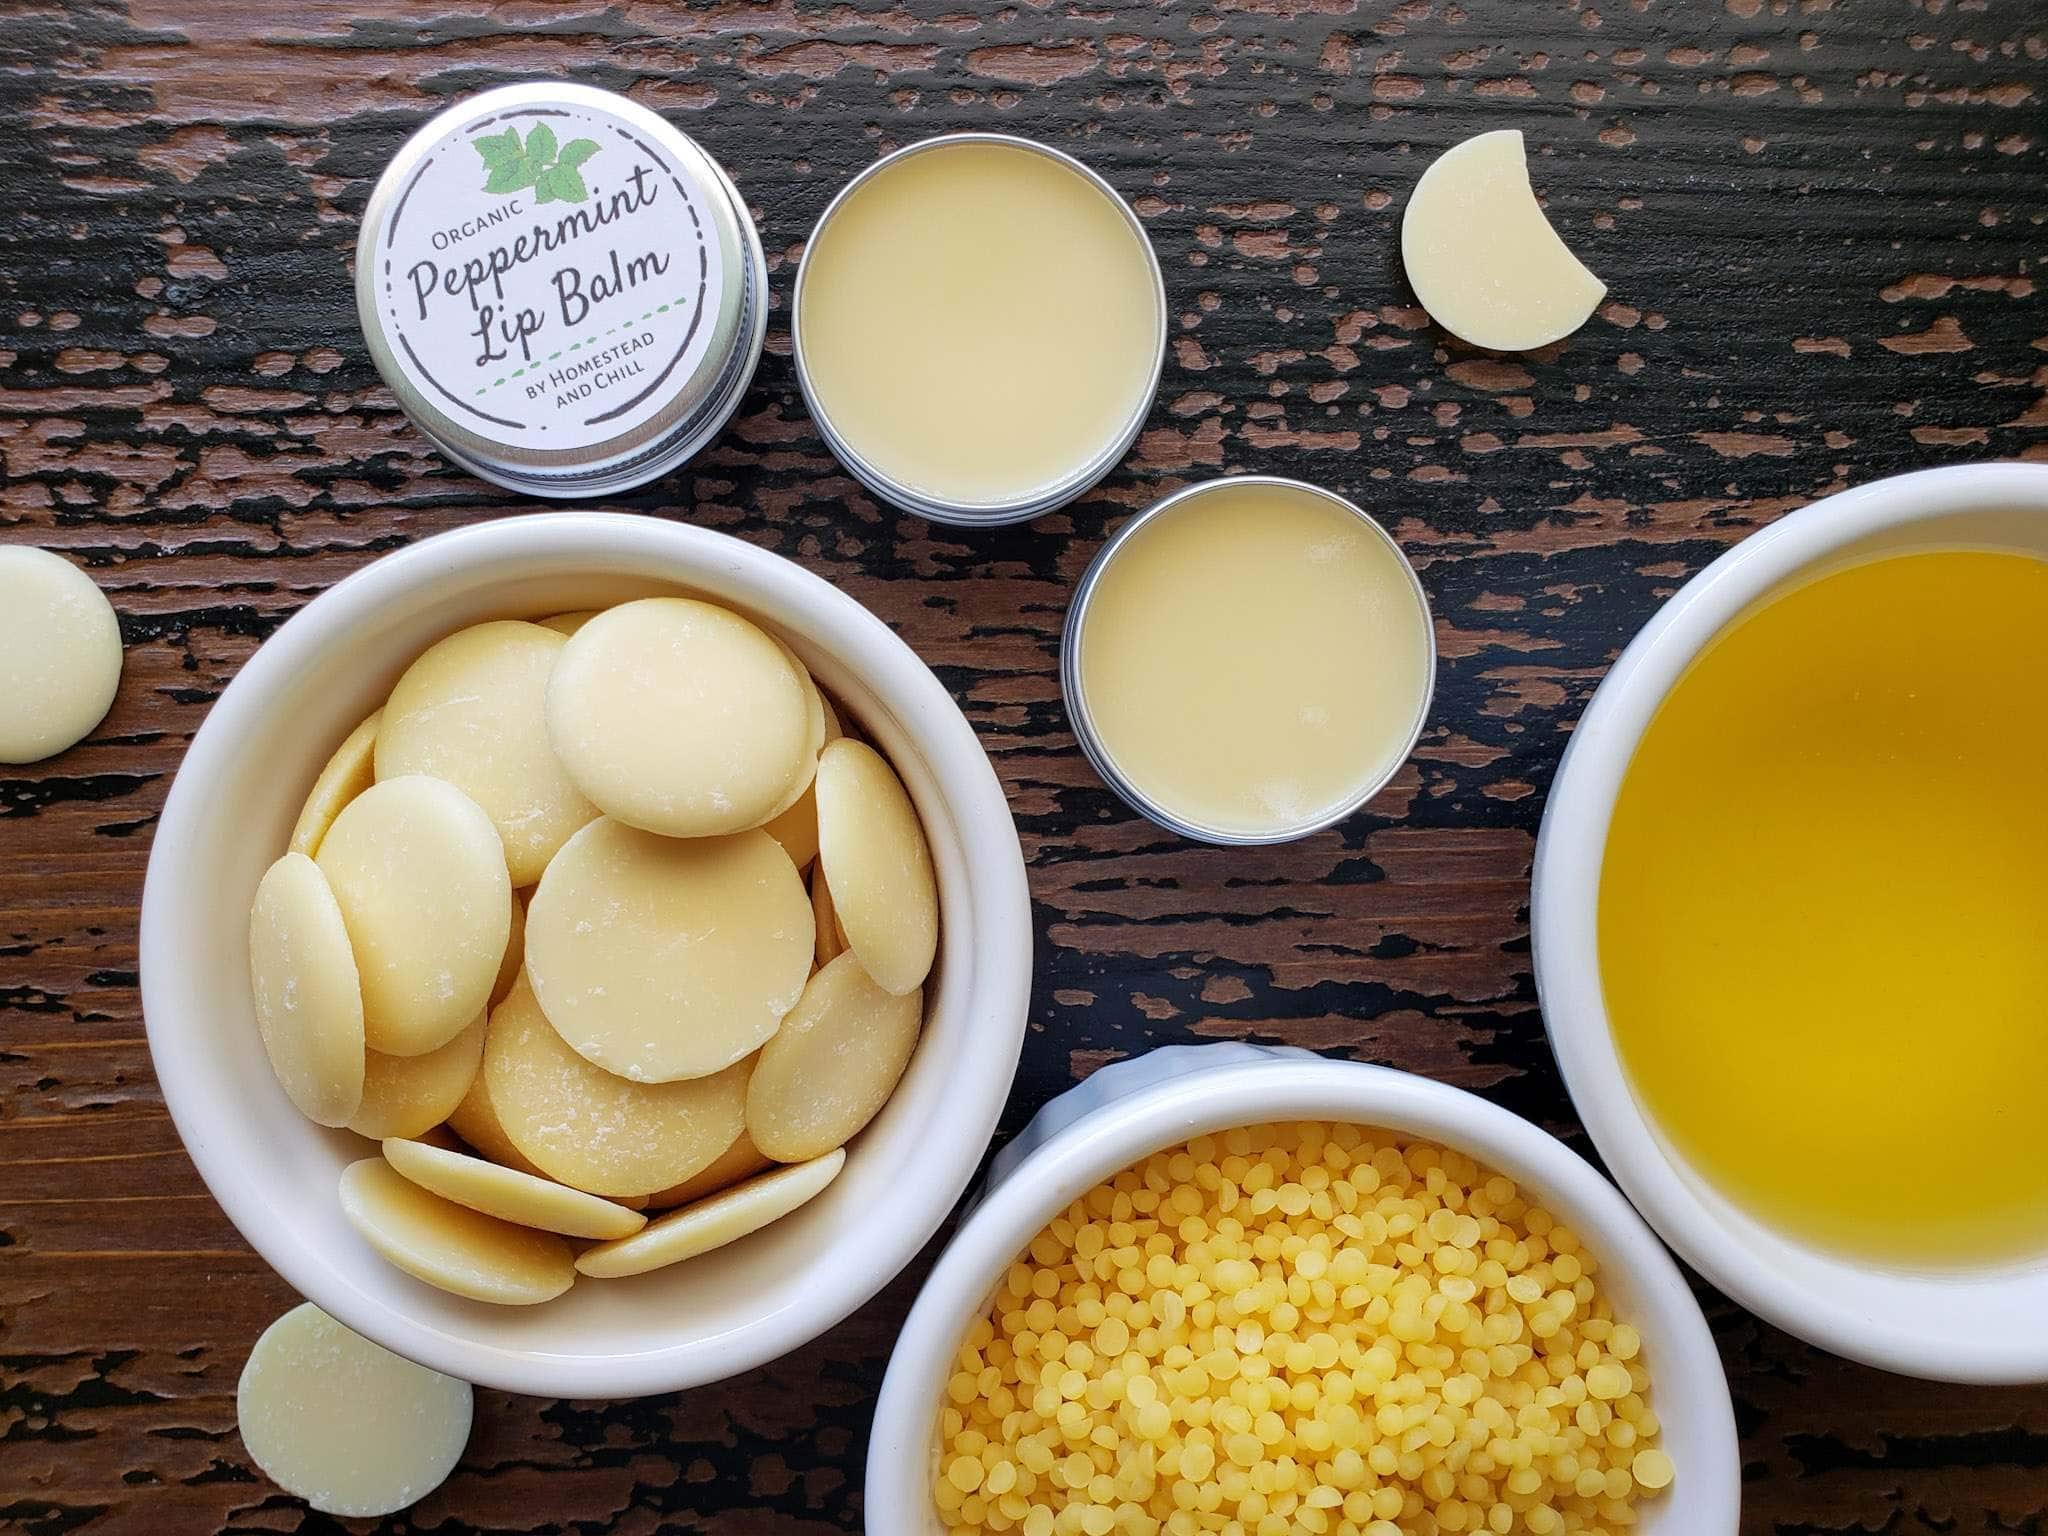 Natural Lip Balm Recipe How to Make Homemade Lip Balm